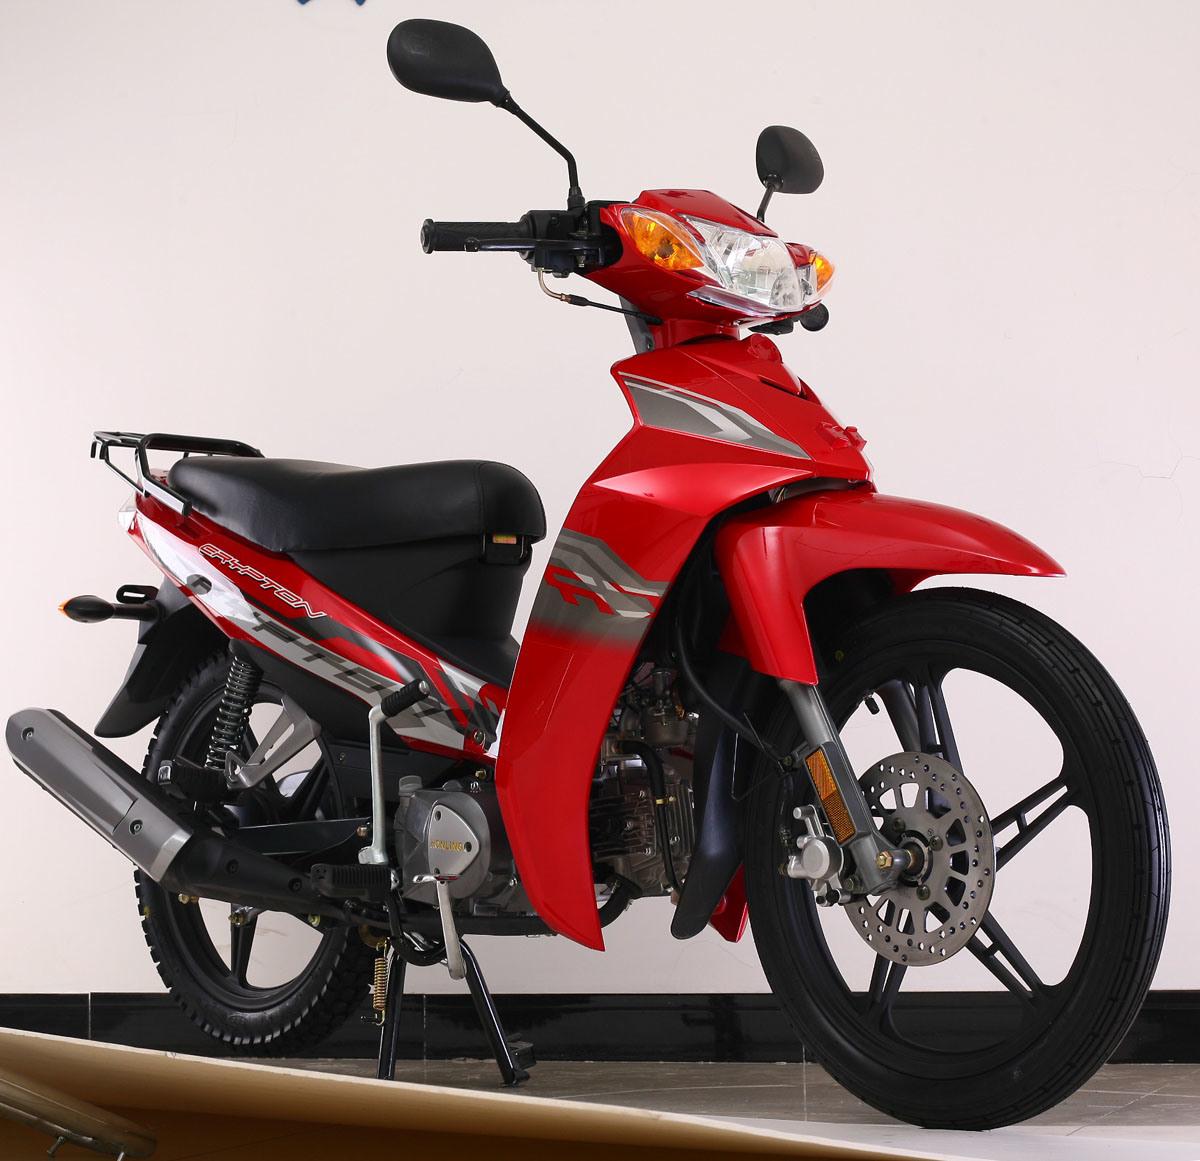 China new cub motorcycle scooter yamaha crypton 110cc for Yamaha motorcycles made in china